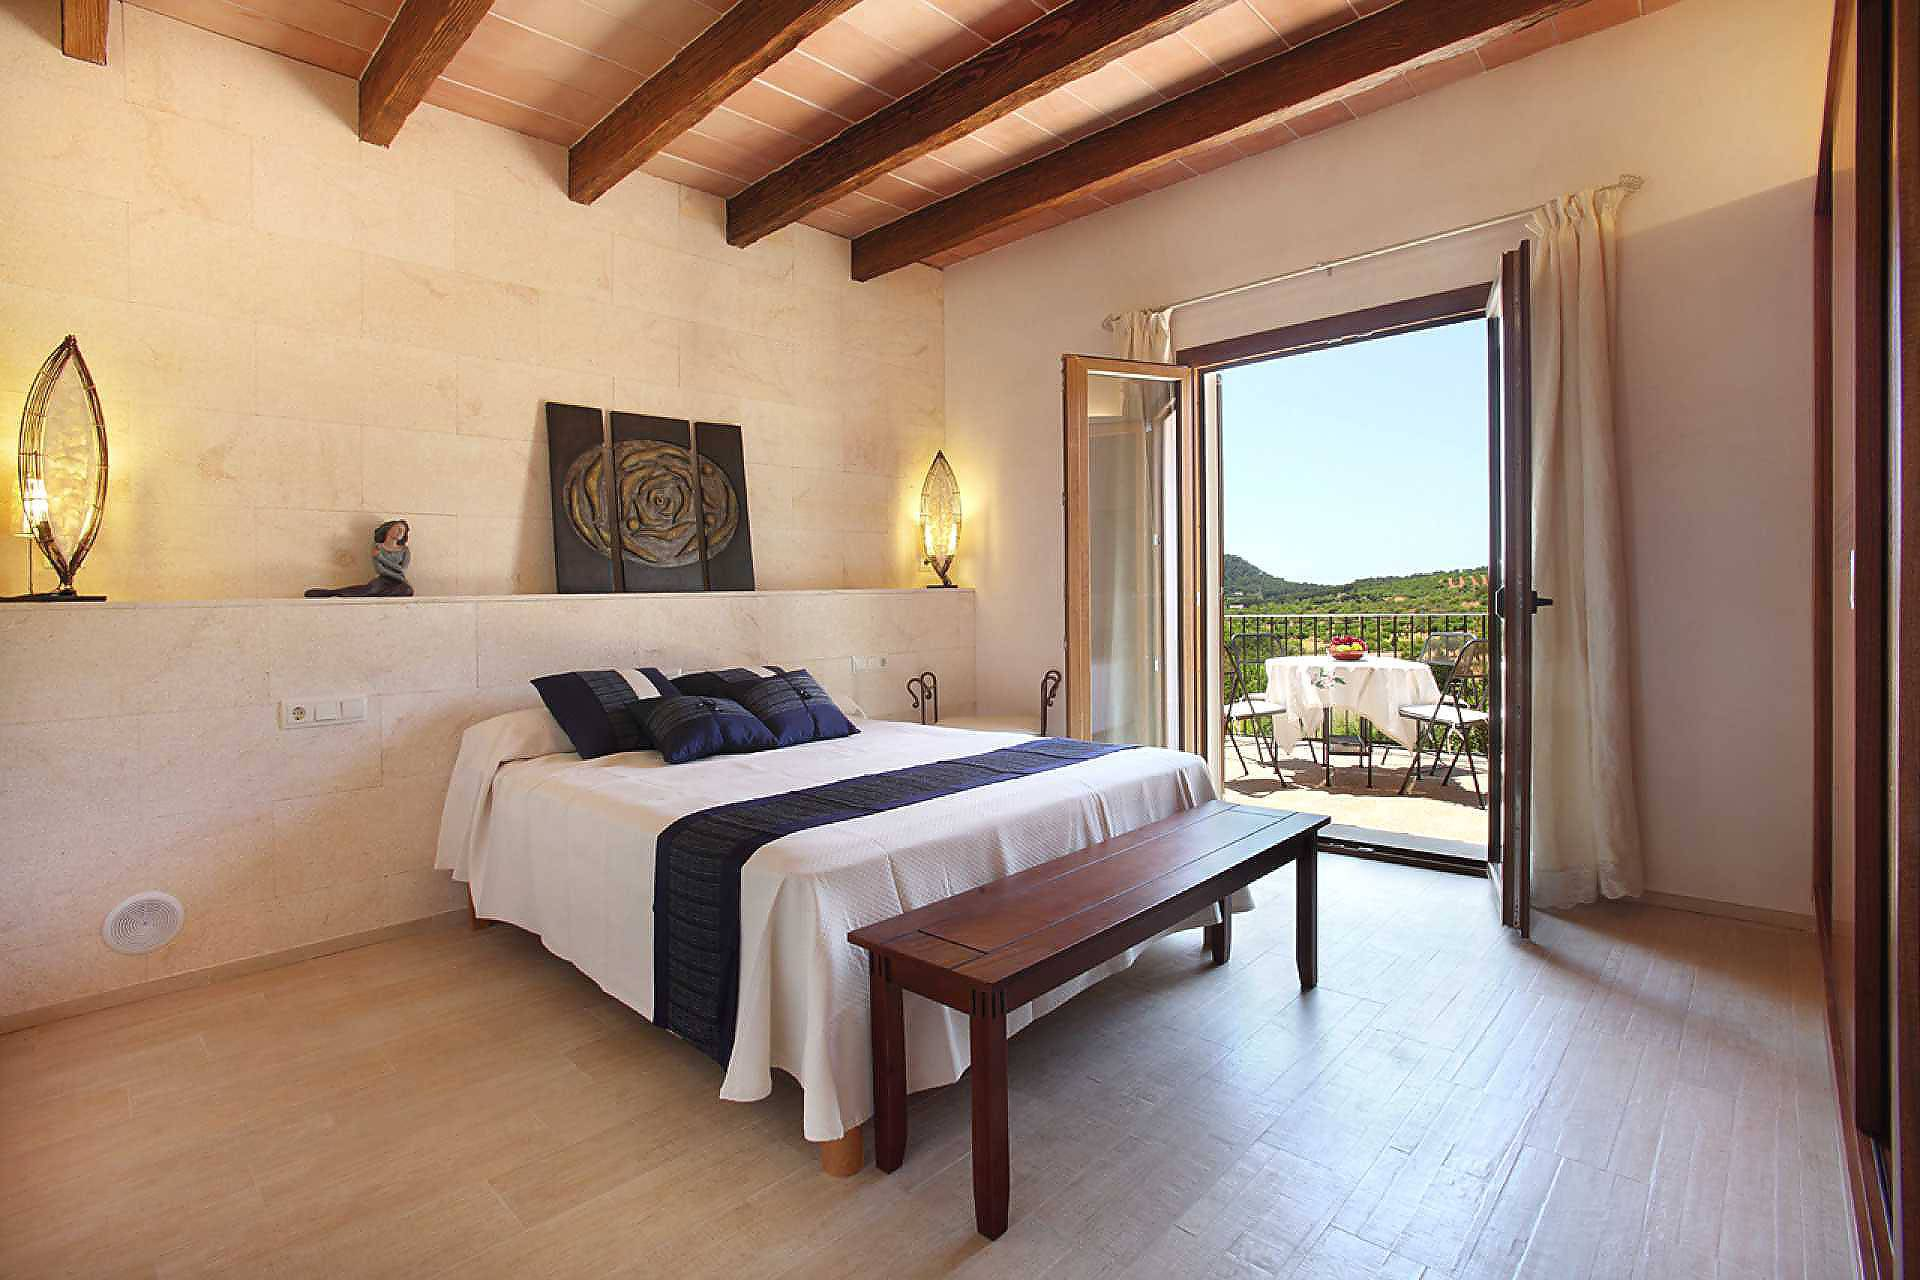 01-45 Exclusive Finca Mallorca East Bild 35